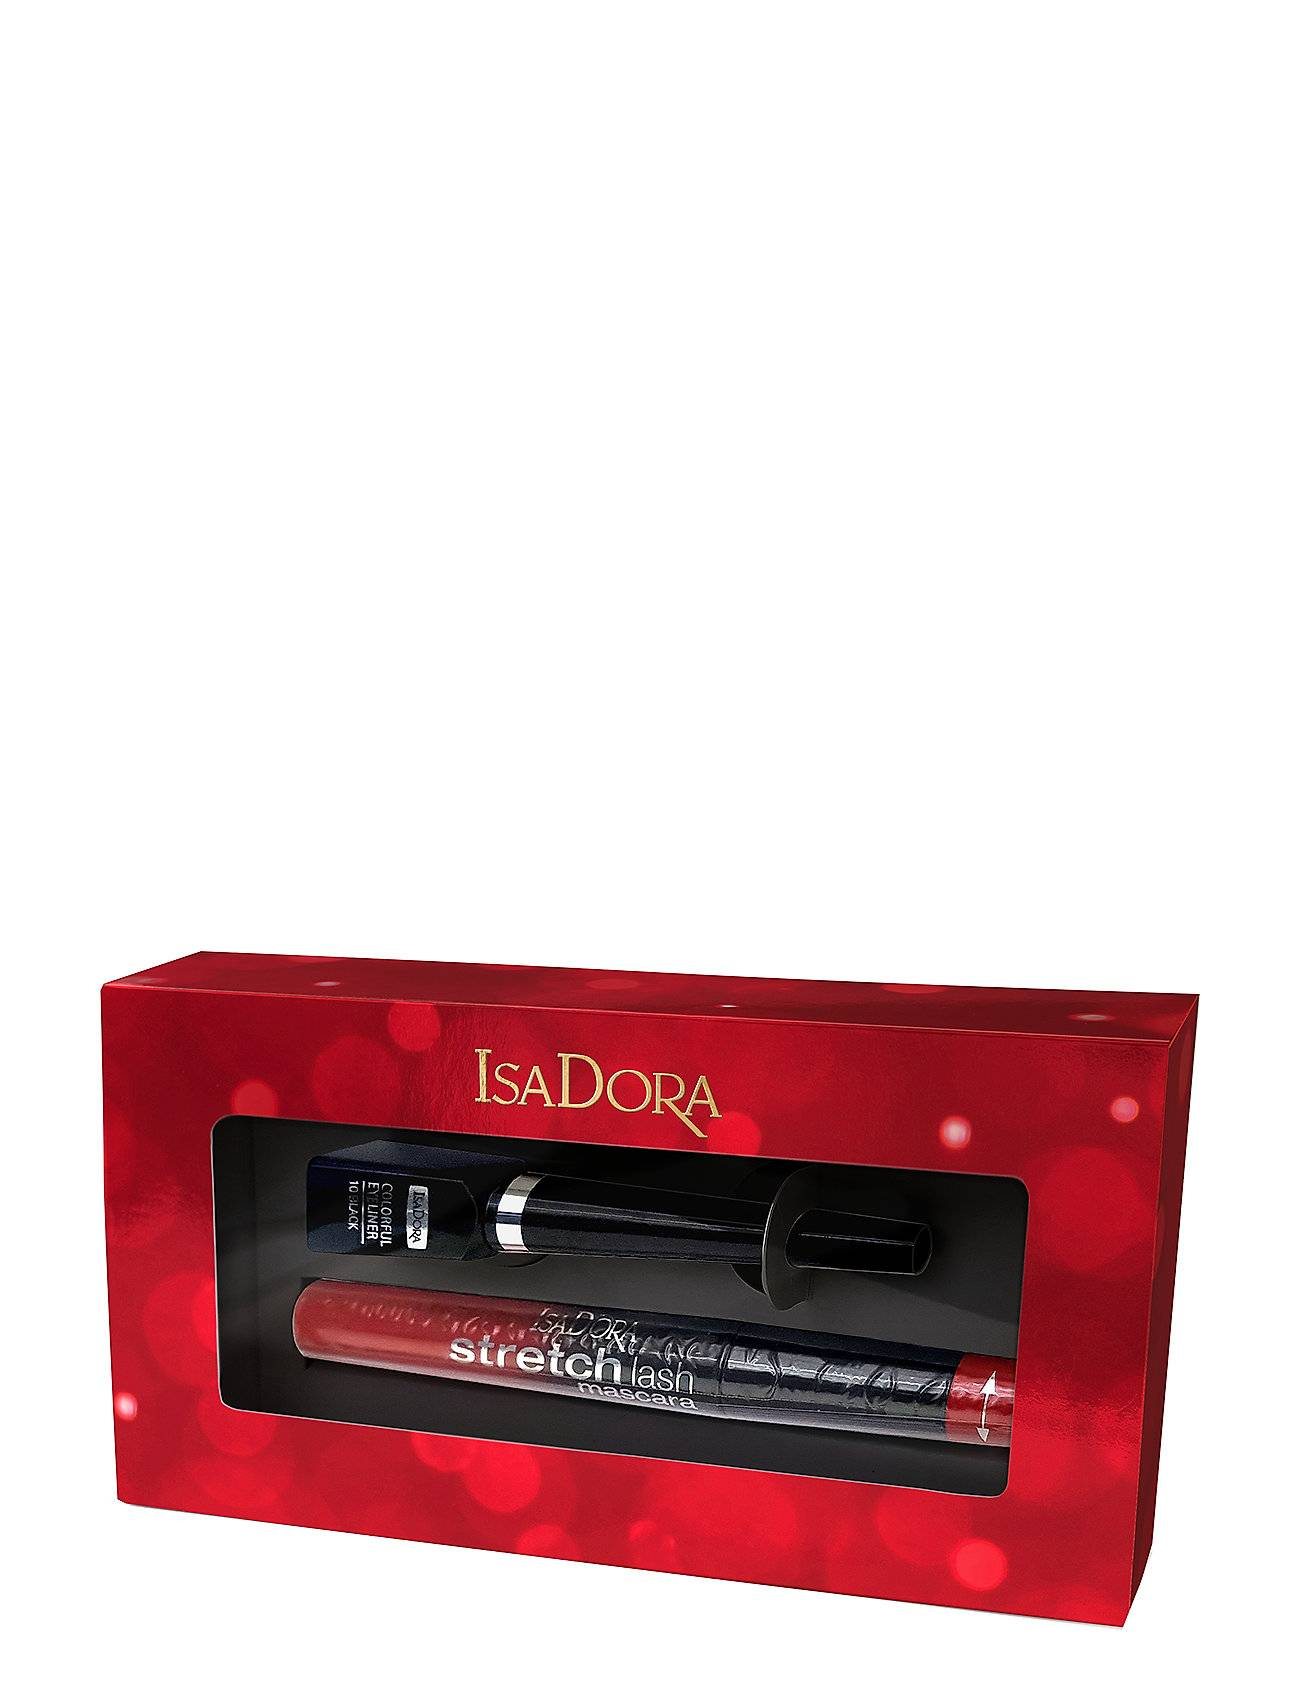 Isadora X-Mas Gift Set Gift Set Strlas Masca 10 Col/Eyeli Hiussarja Monivärinen/Kuvioitu Isadora